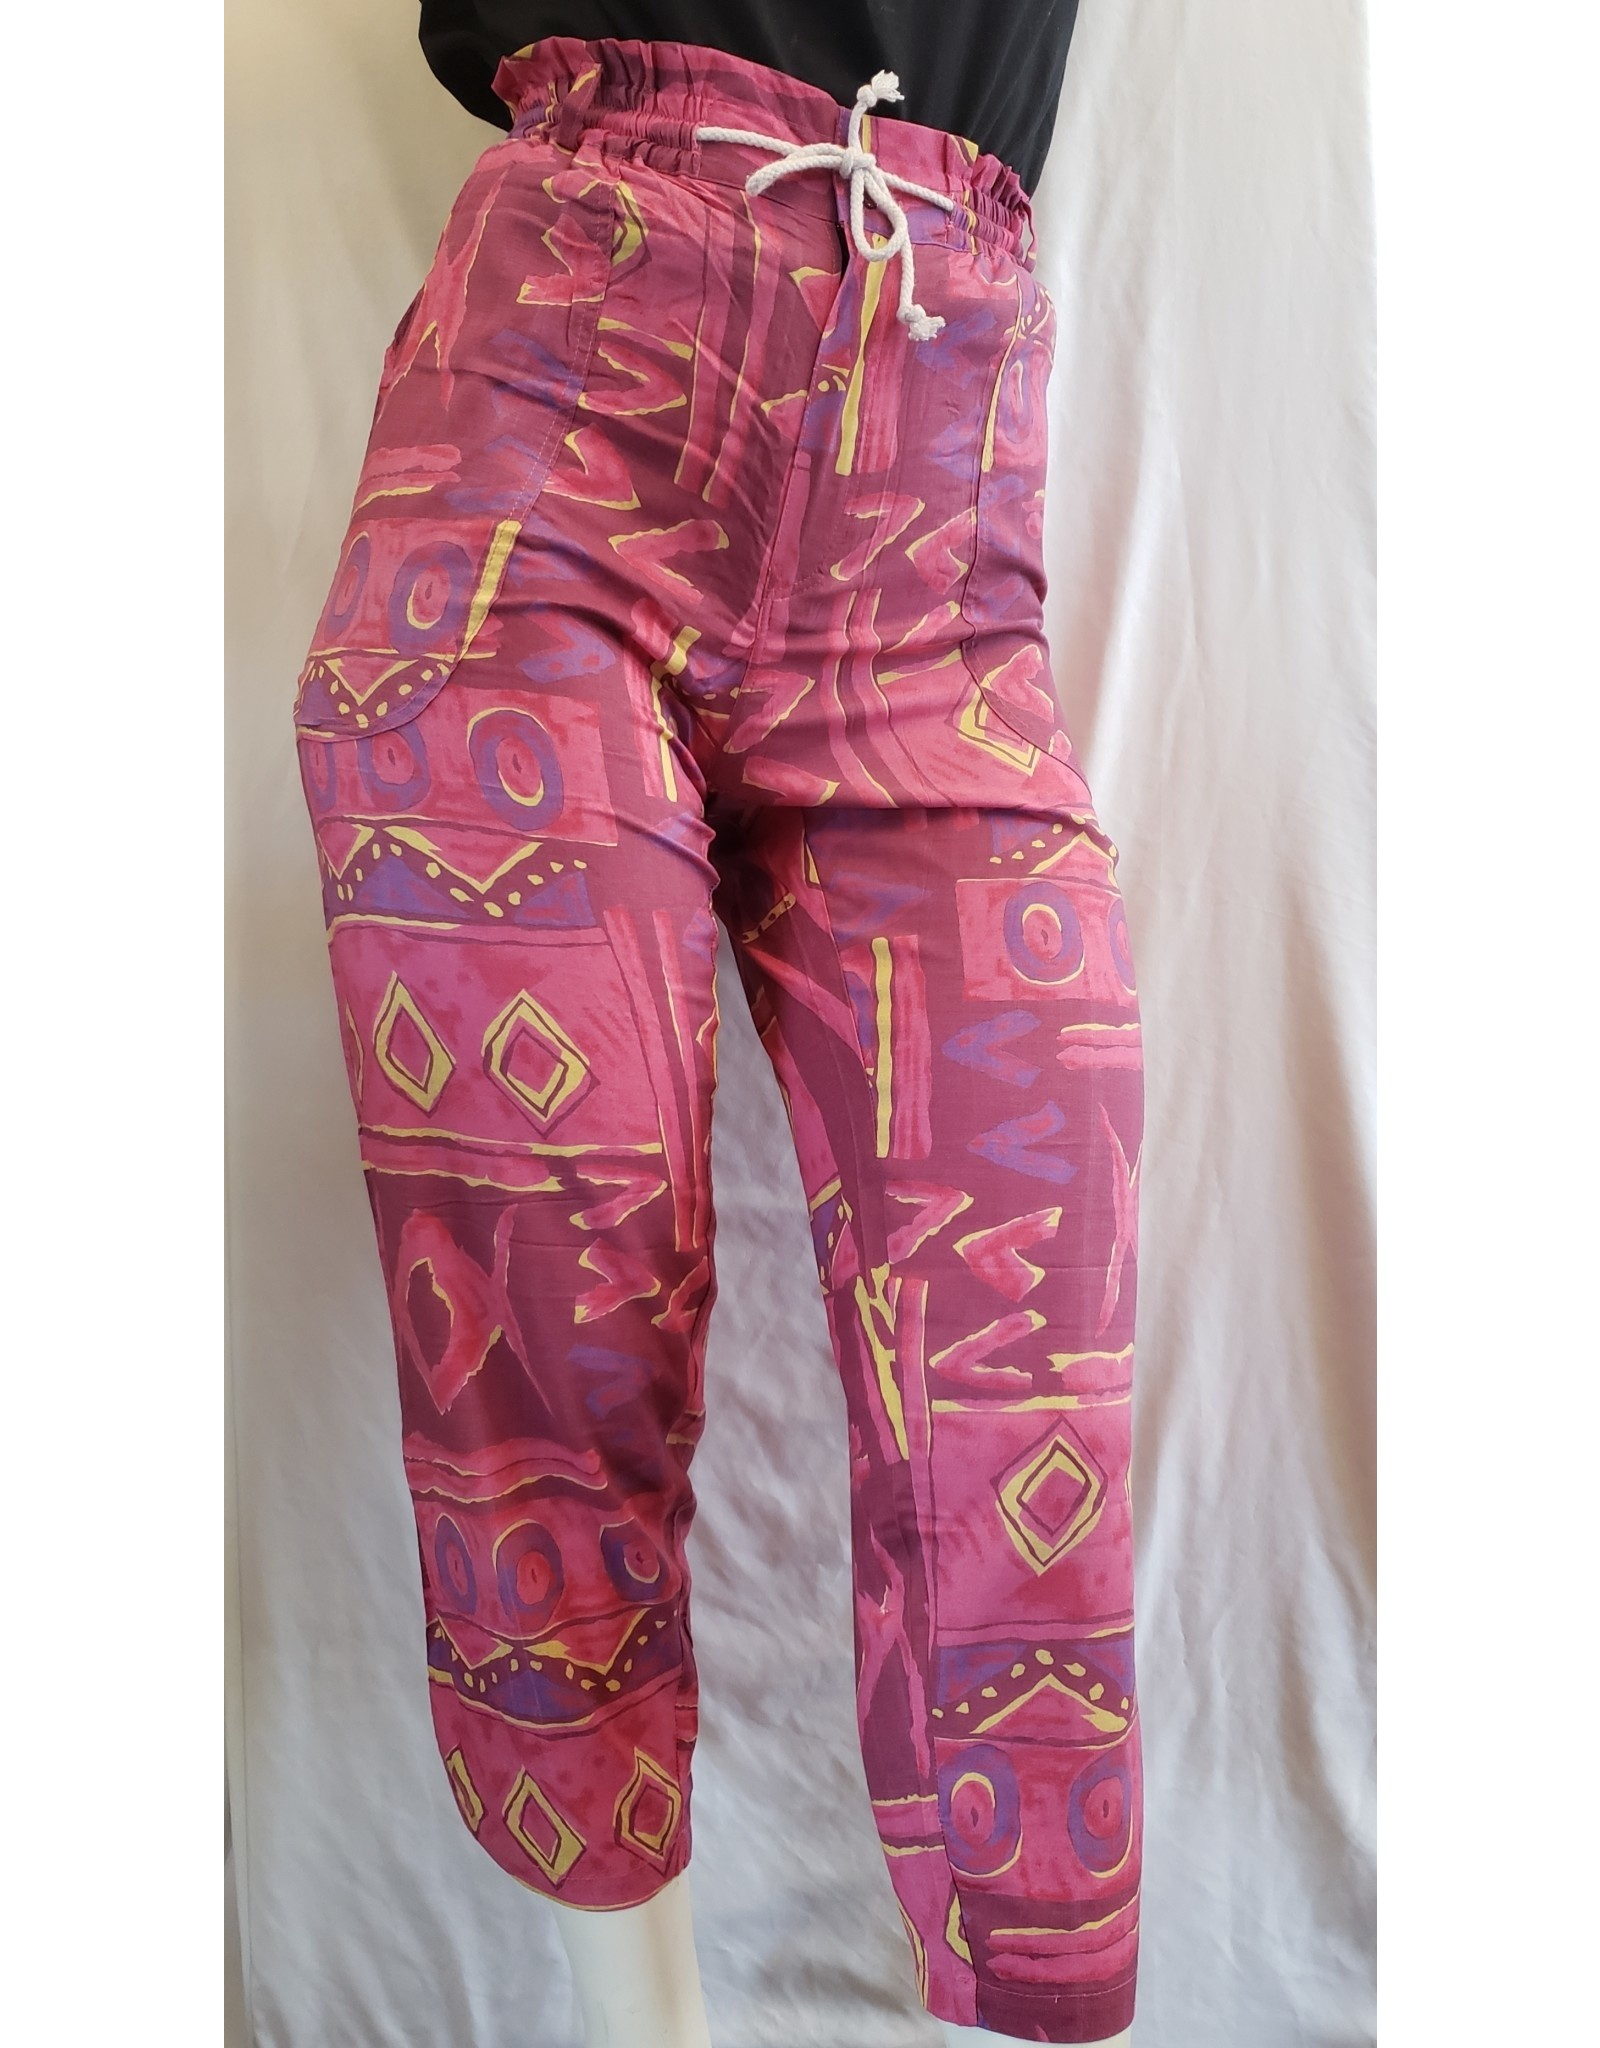 Patchwork Drawstring Pants